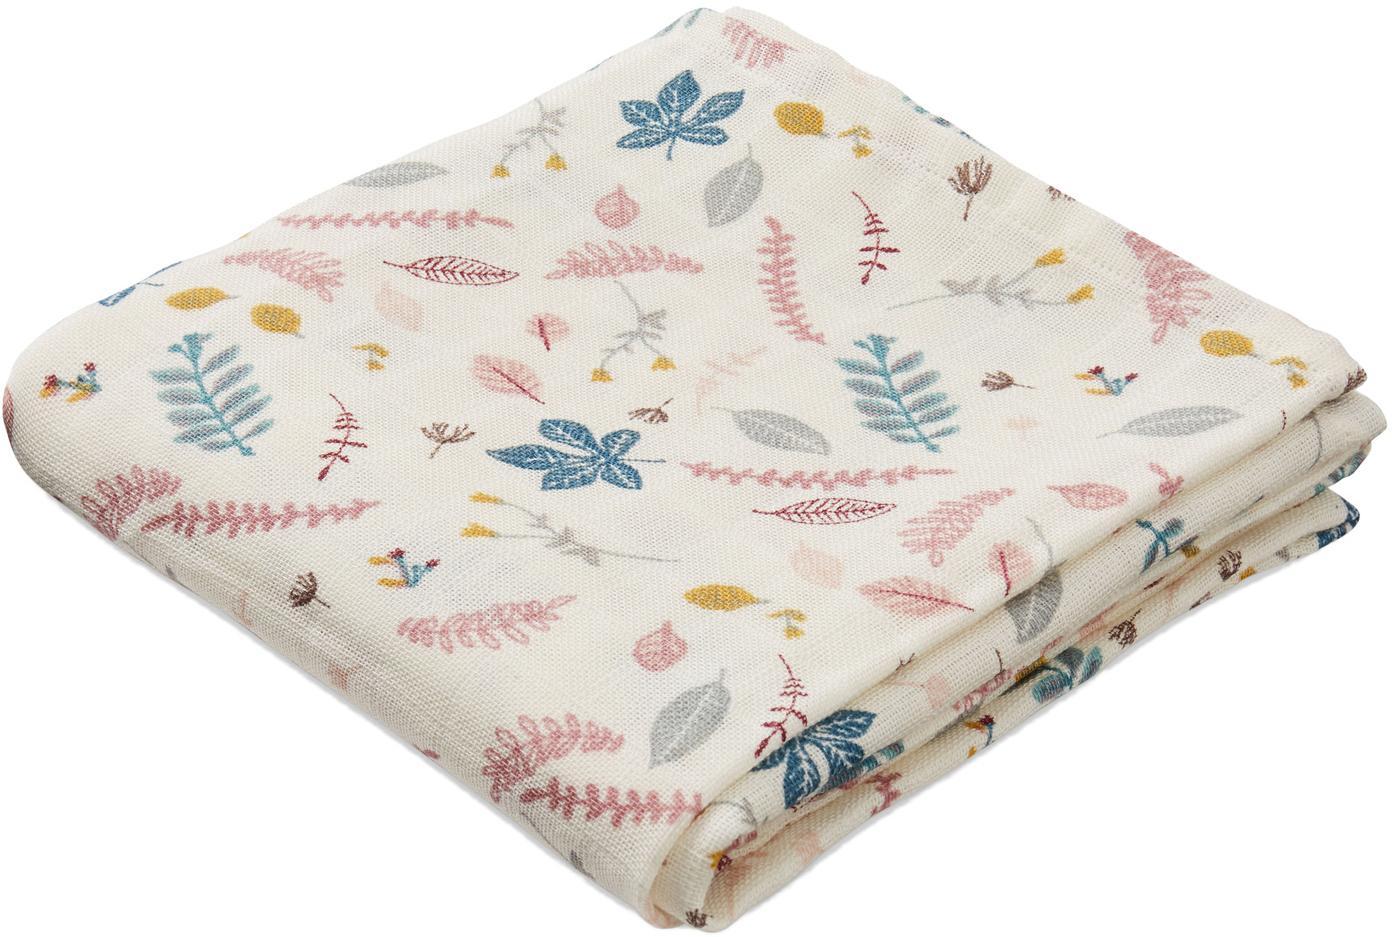 Pañales de tela Pressed Leaves, 2uds., Algodón orgánico, Crema, rosa, azul, gris, An 70 x L 70 cm